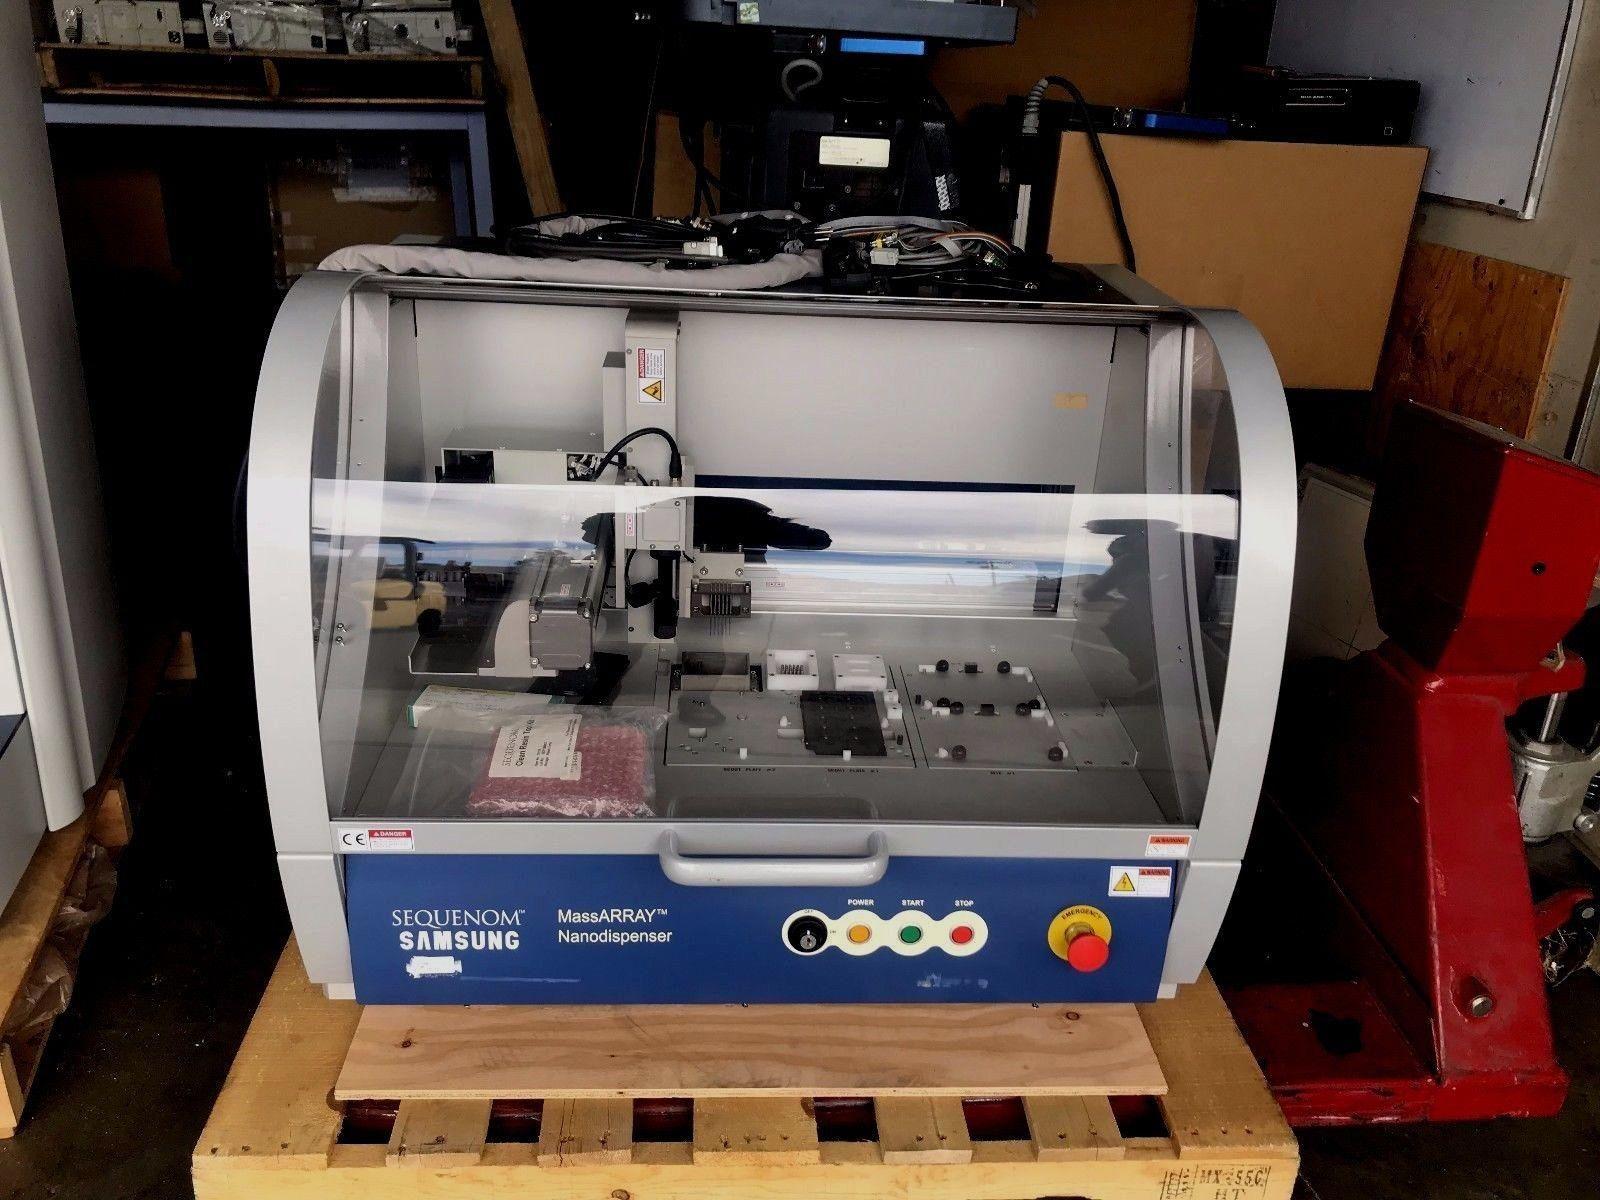 Sequenom MassARRAY Nanodispenser System/Parts Only- No Computer